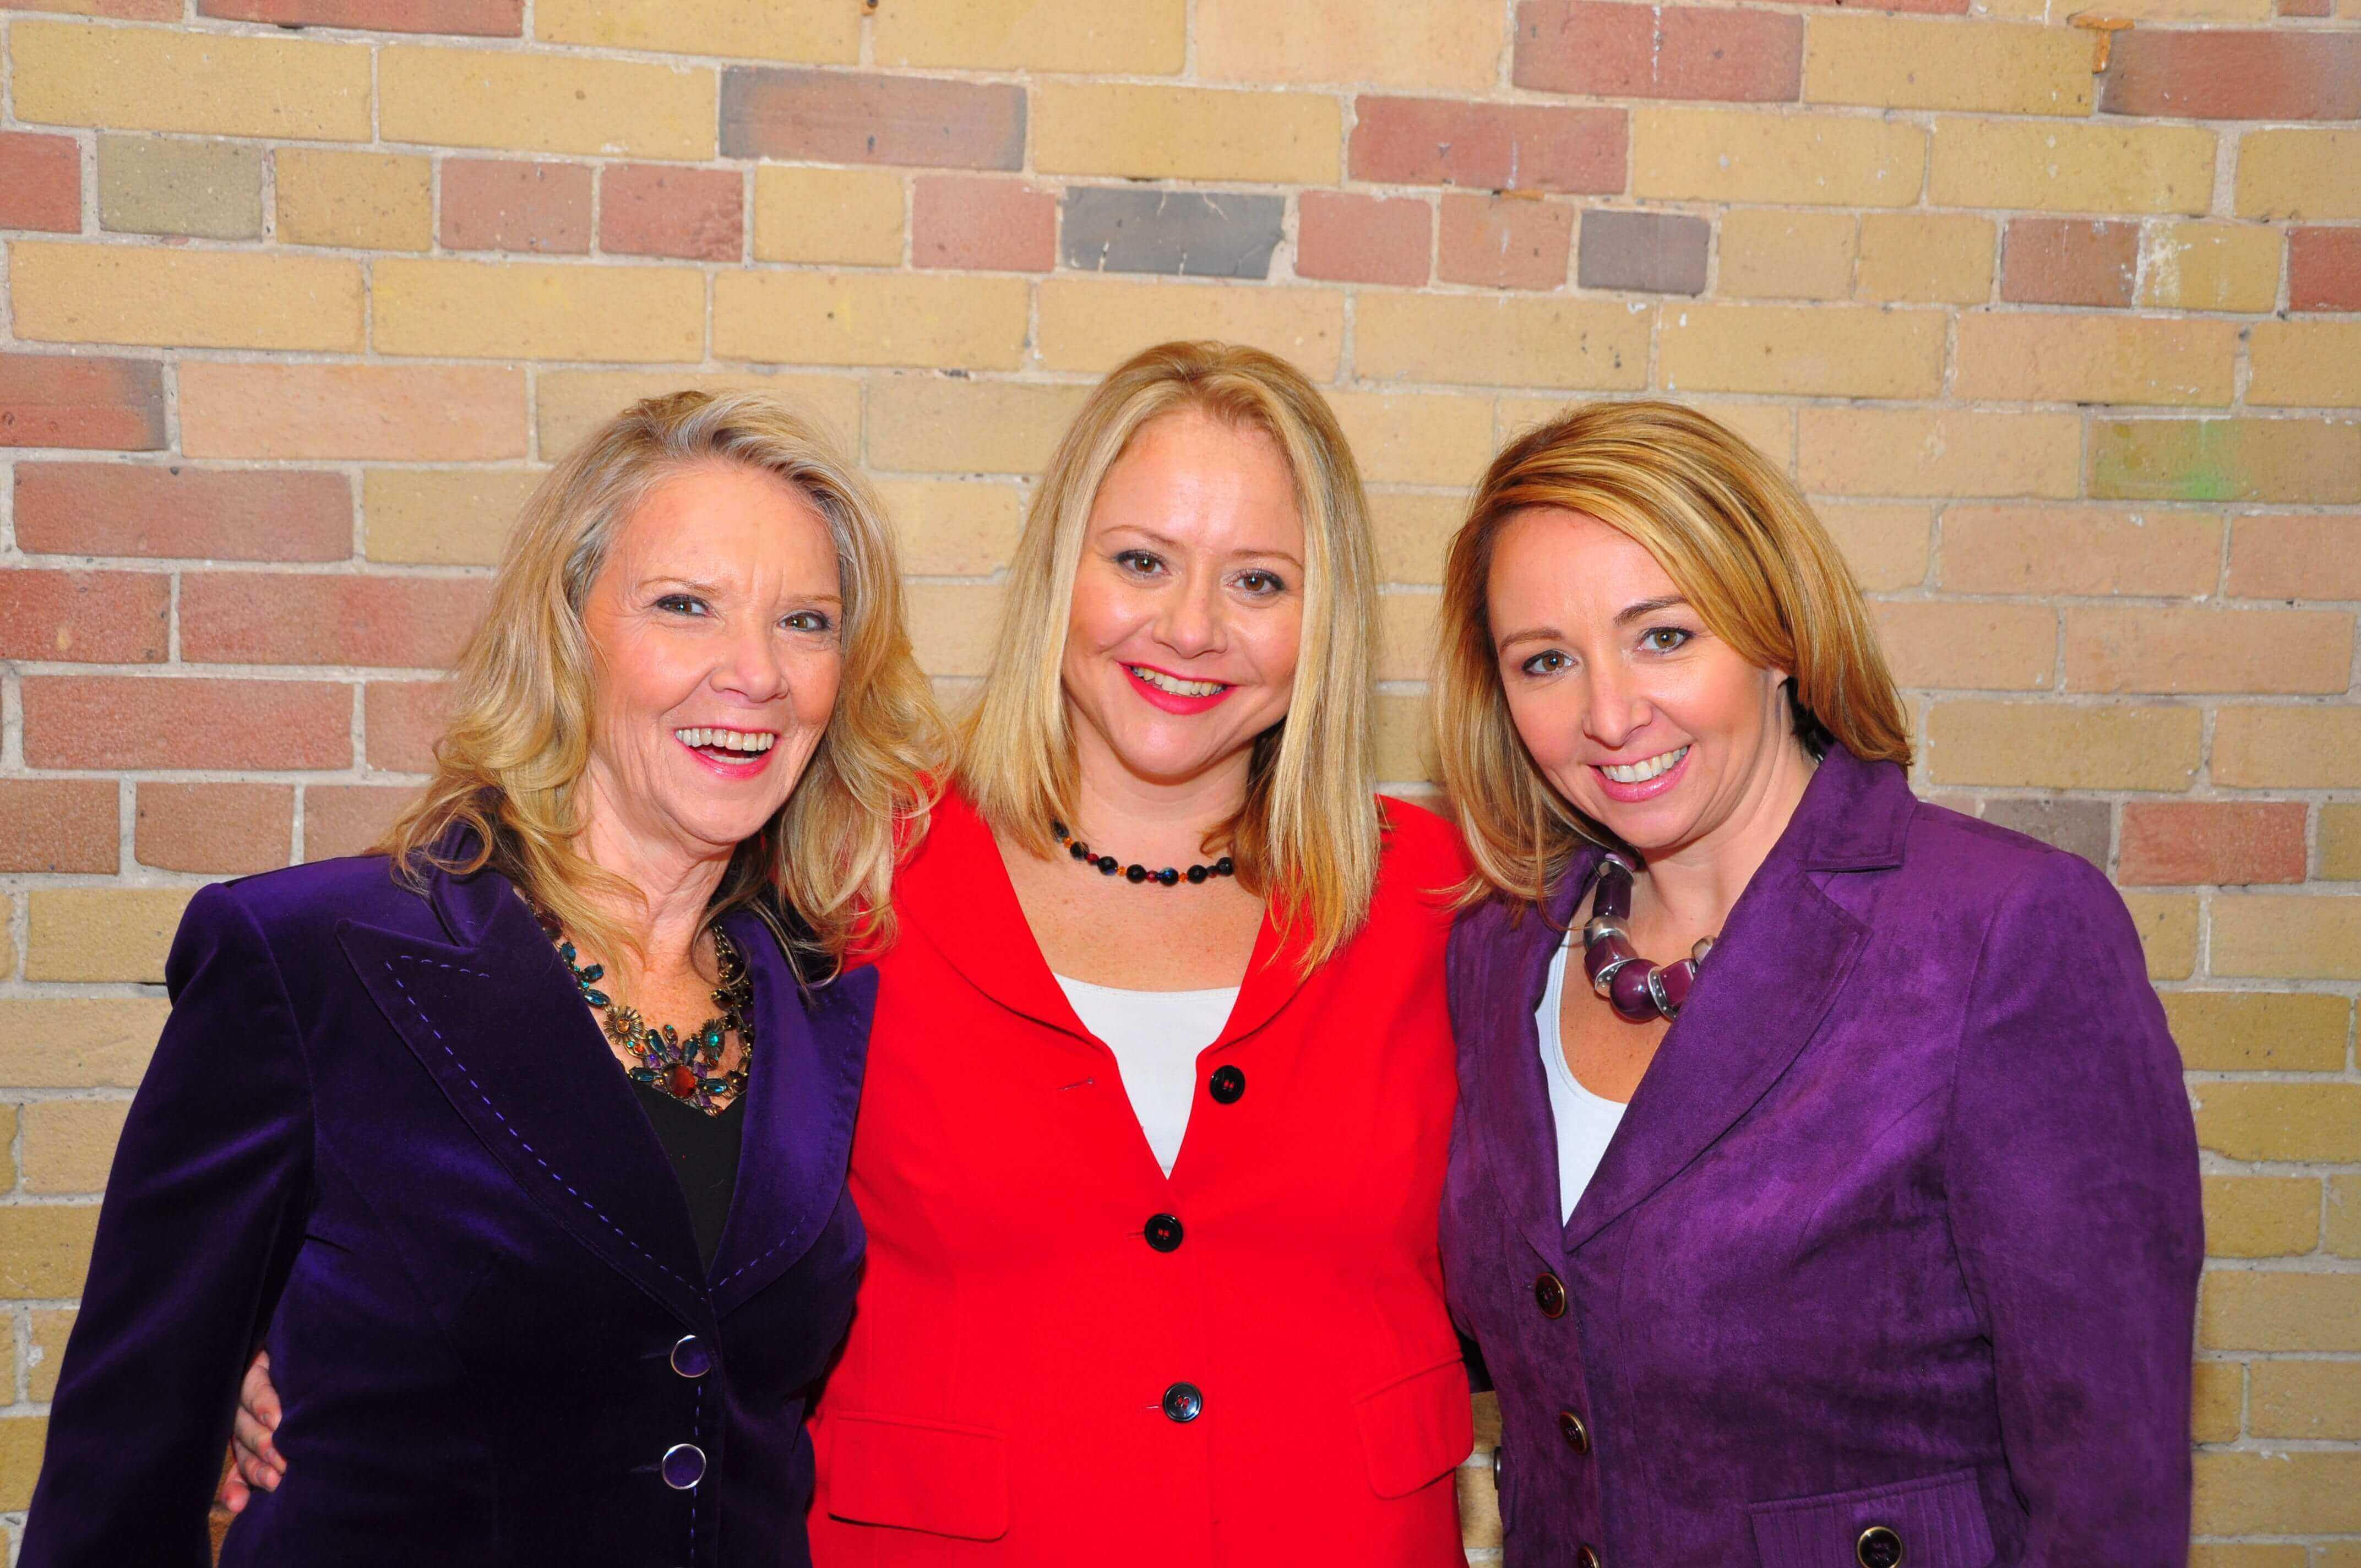 Anne Dranitsaris, Nancy Dranitsaris and Heather Hilliard